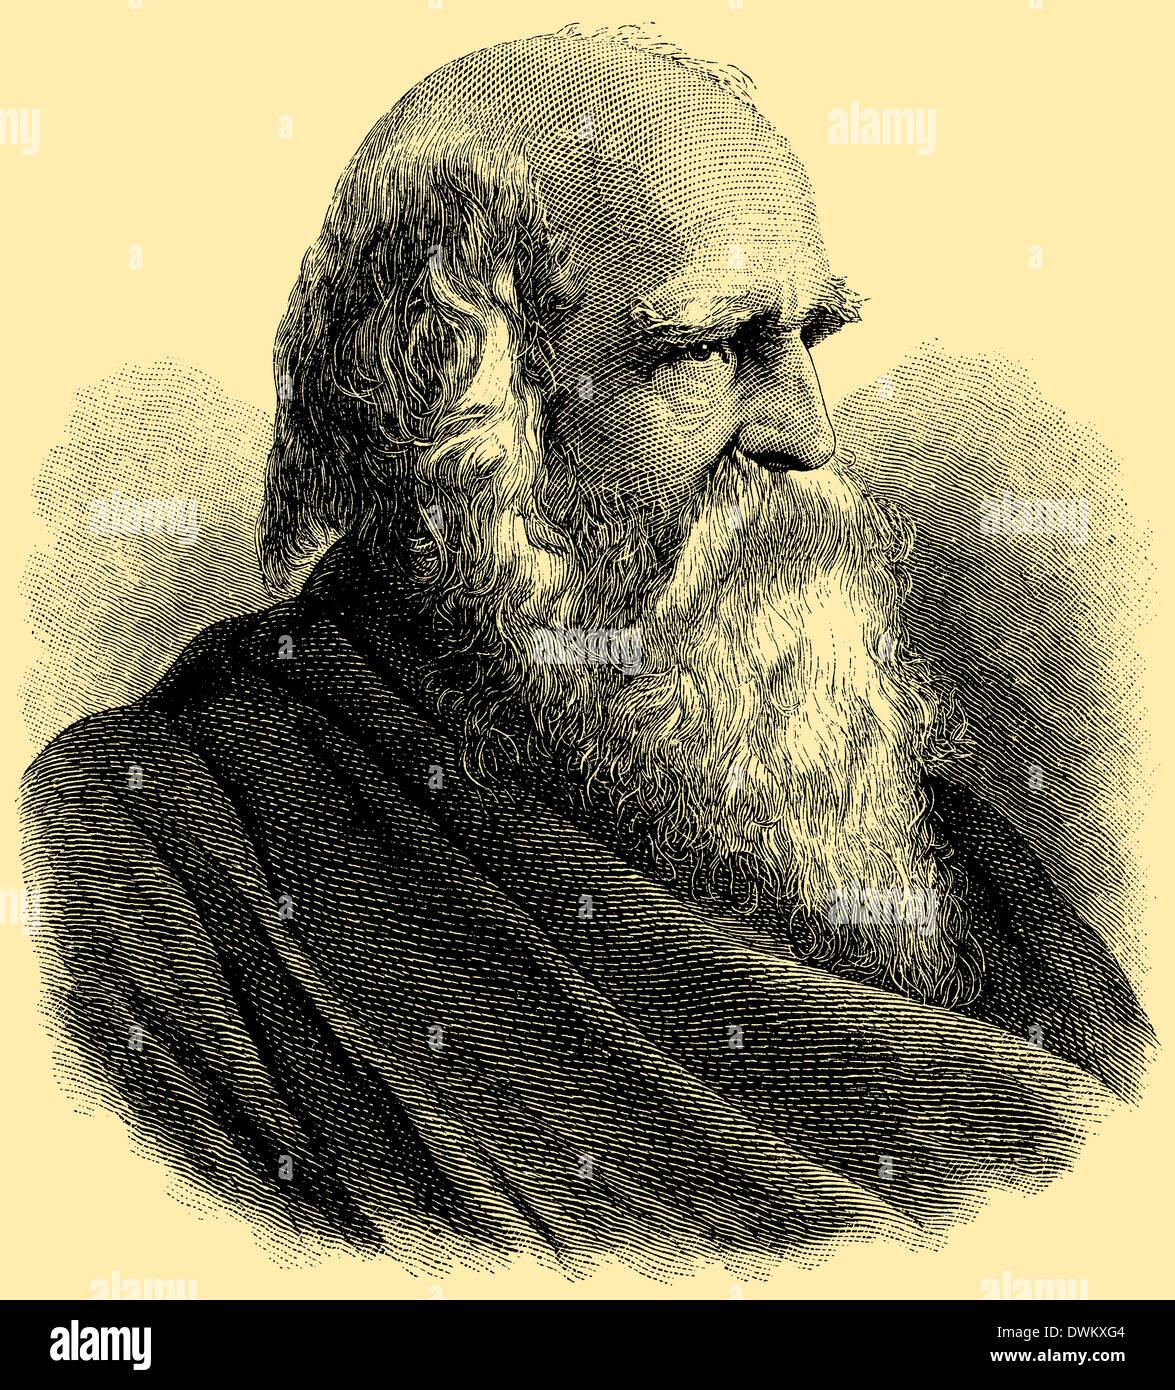 William Cullen Bryant november